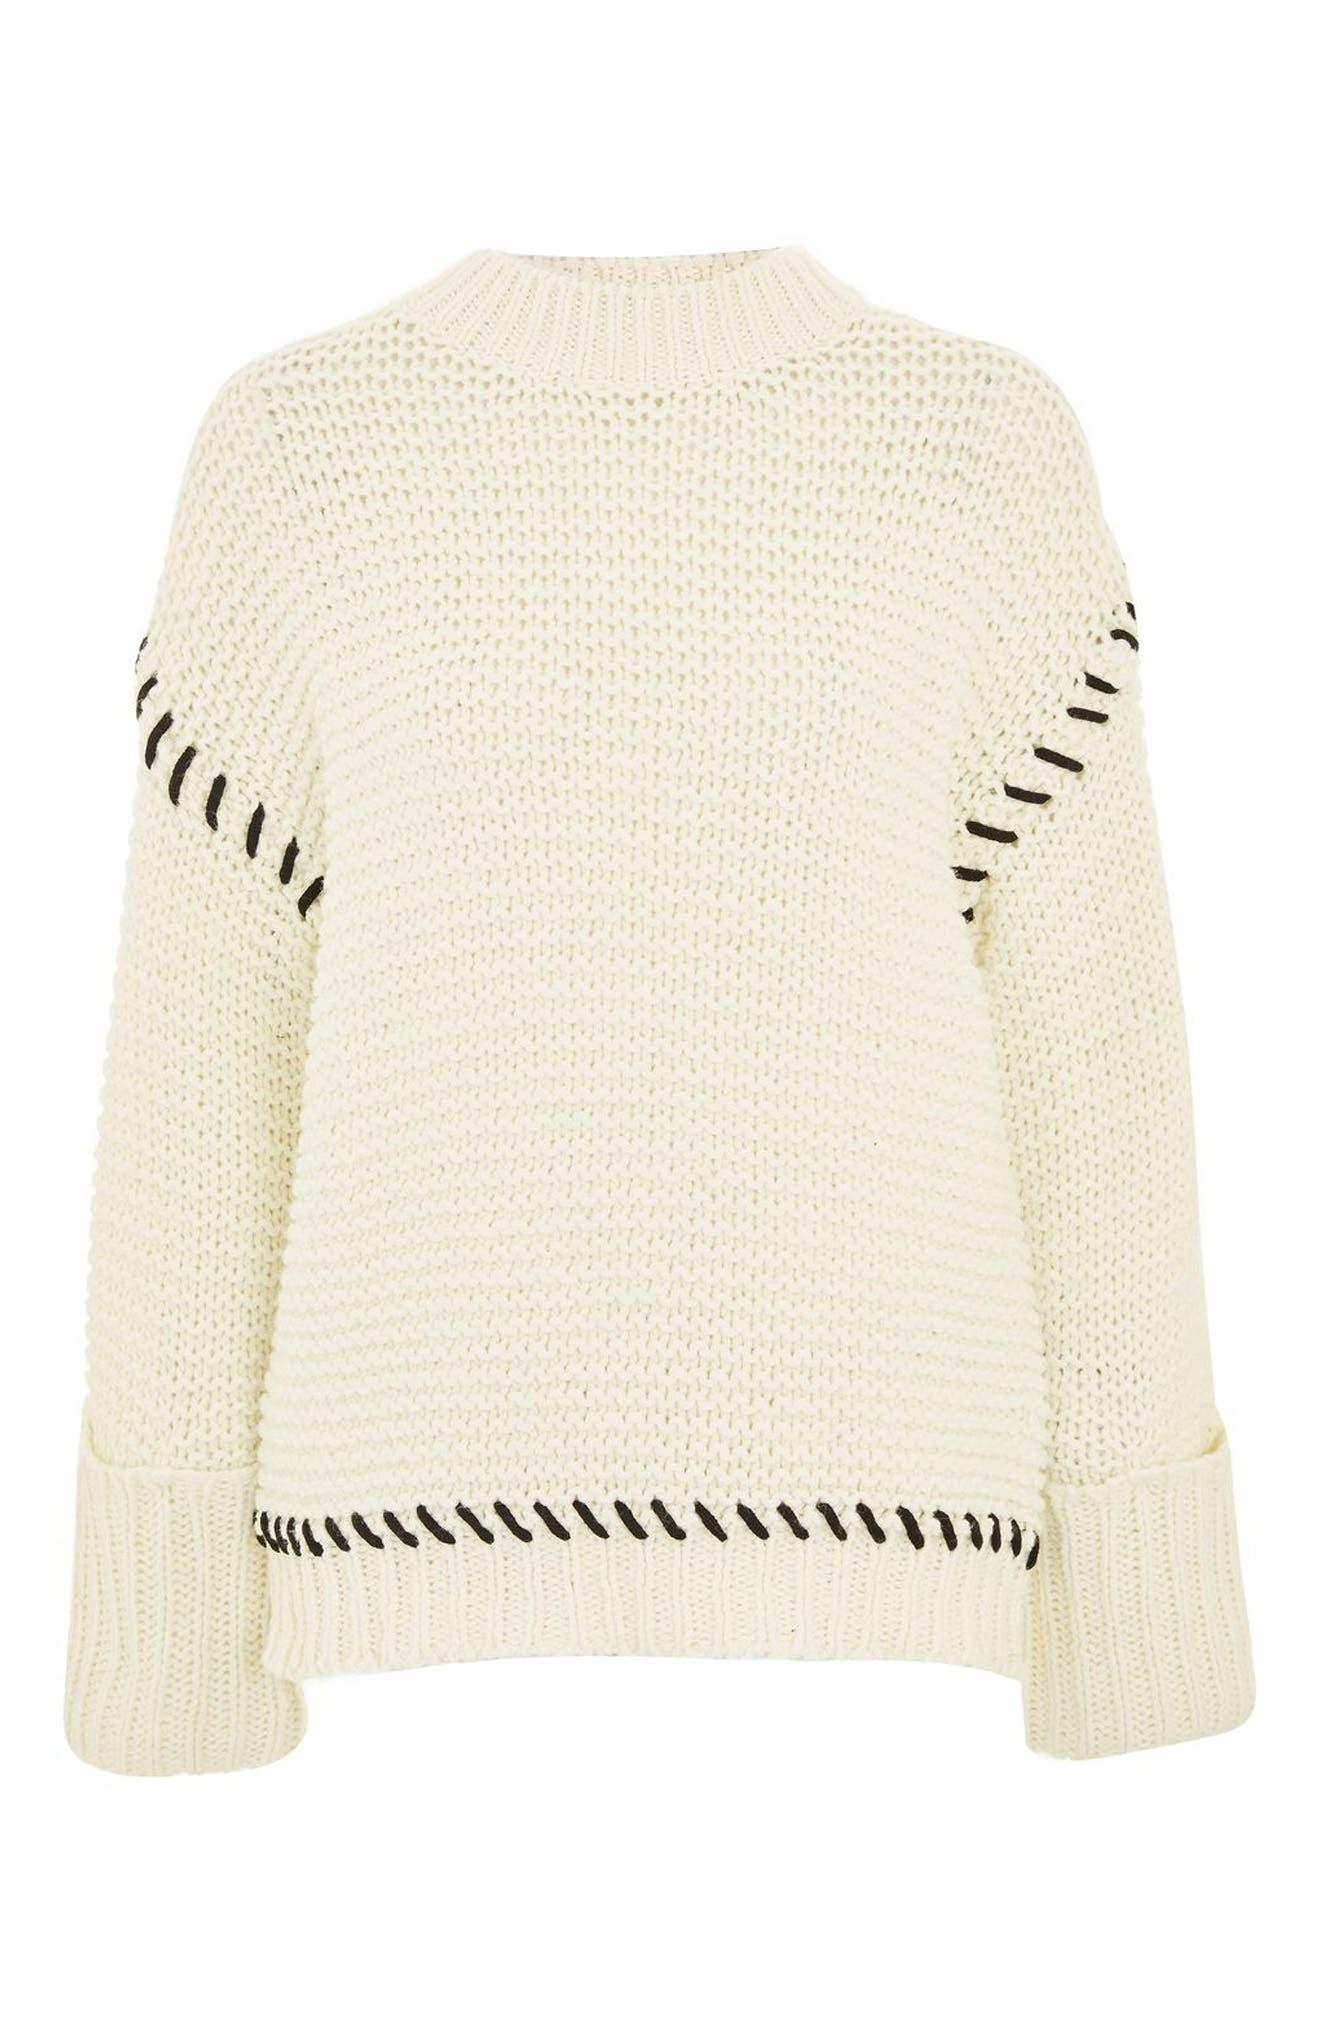 Whipstitch Sweater,                             Alternate thumbnail 5, color,                             Cream Multi